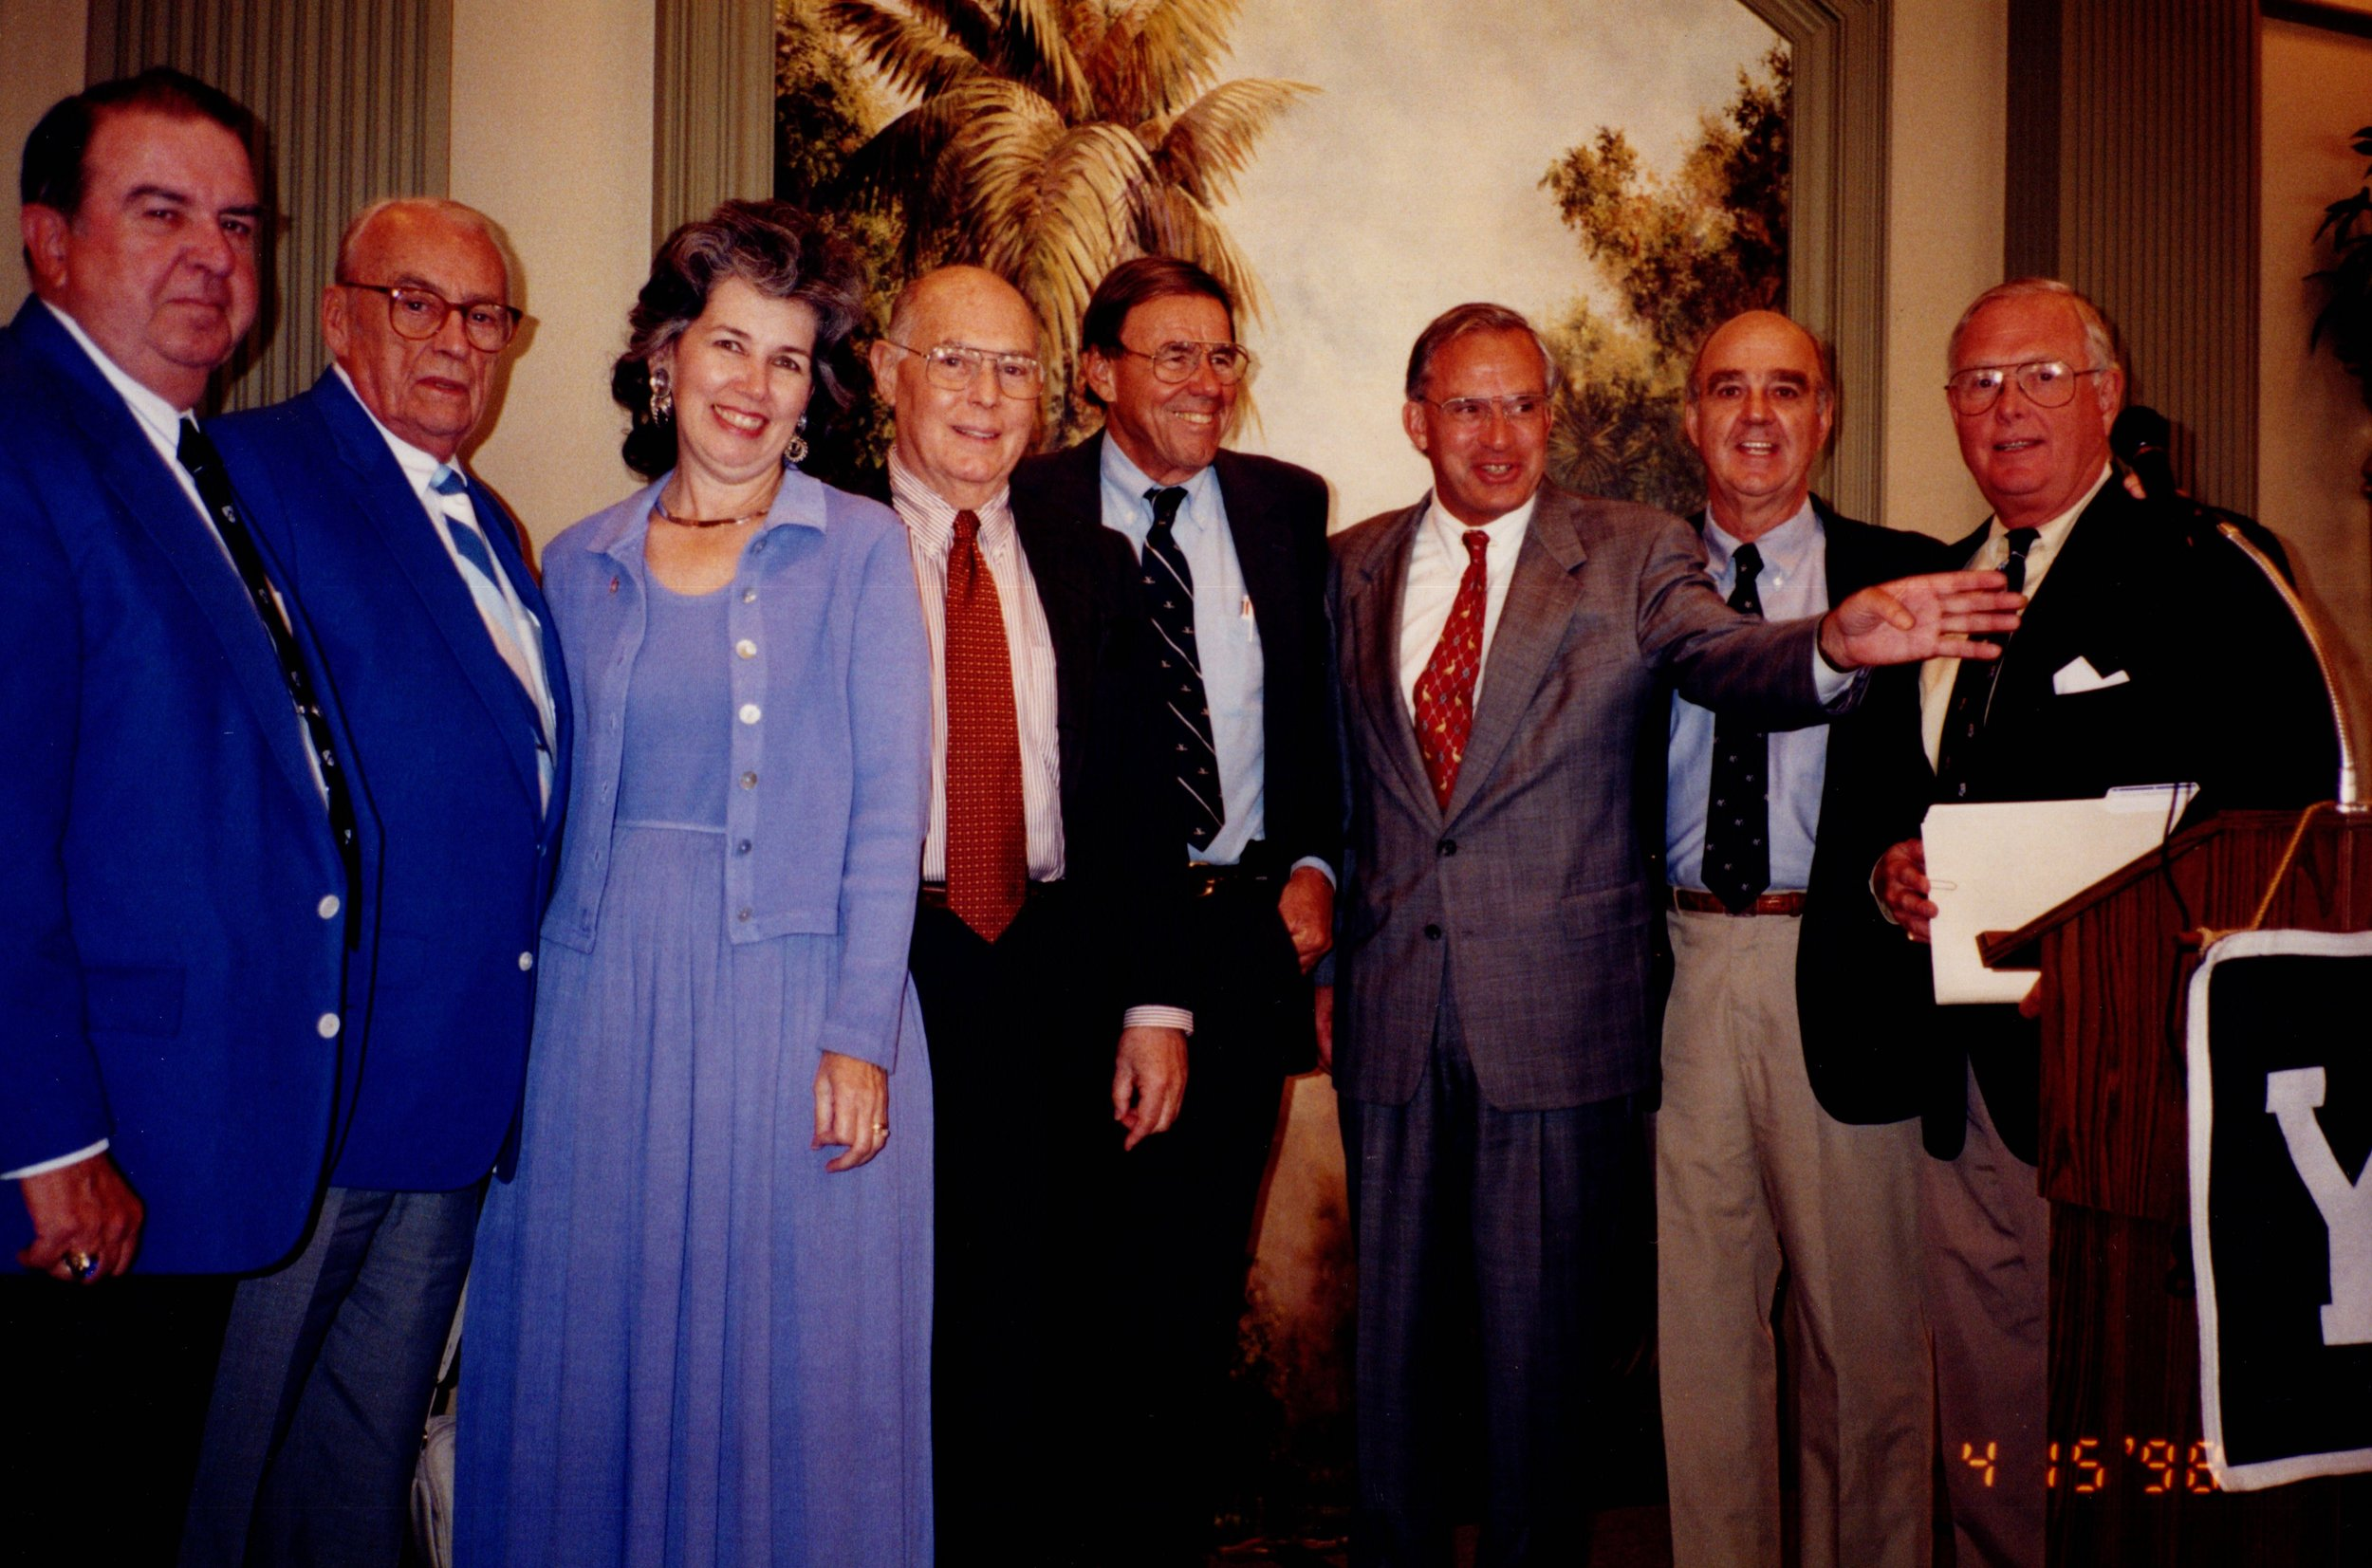 DICK BENNETT '52, BUD MERRELL (BROWN), BILL MACILVAINE (PRINCETON), BOB BENNETT '44